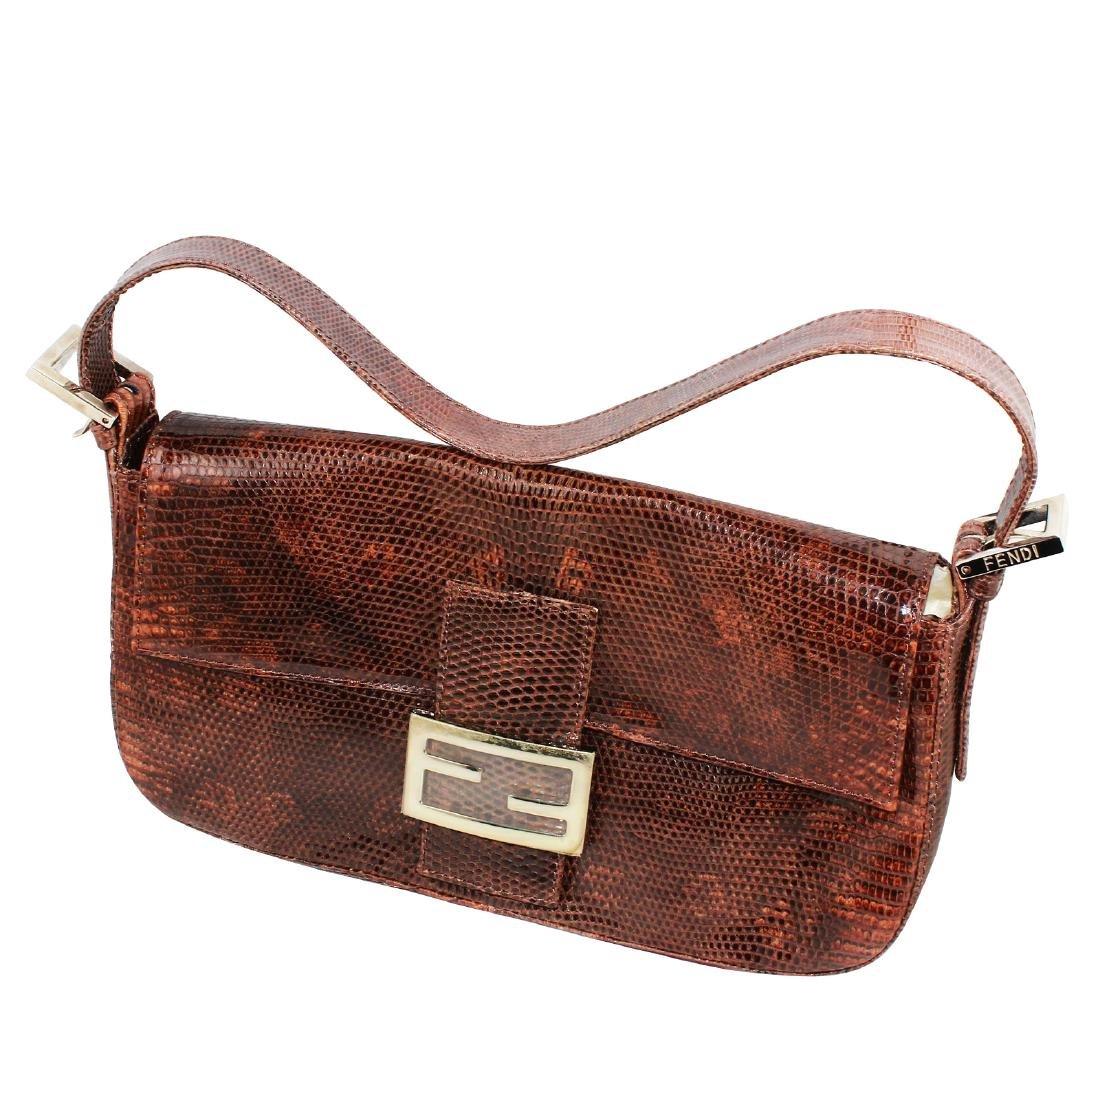 NEW Fendi Lizard Baguette Brown Handbag with Flap